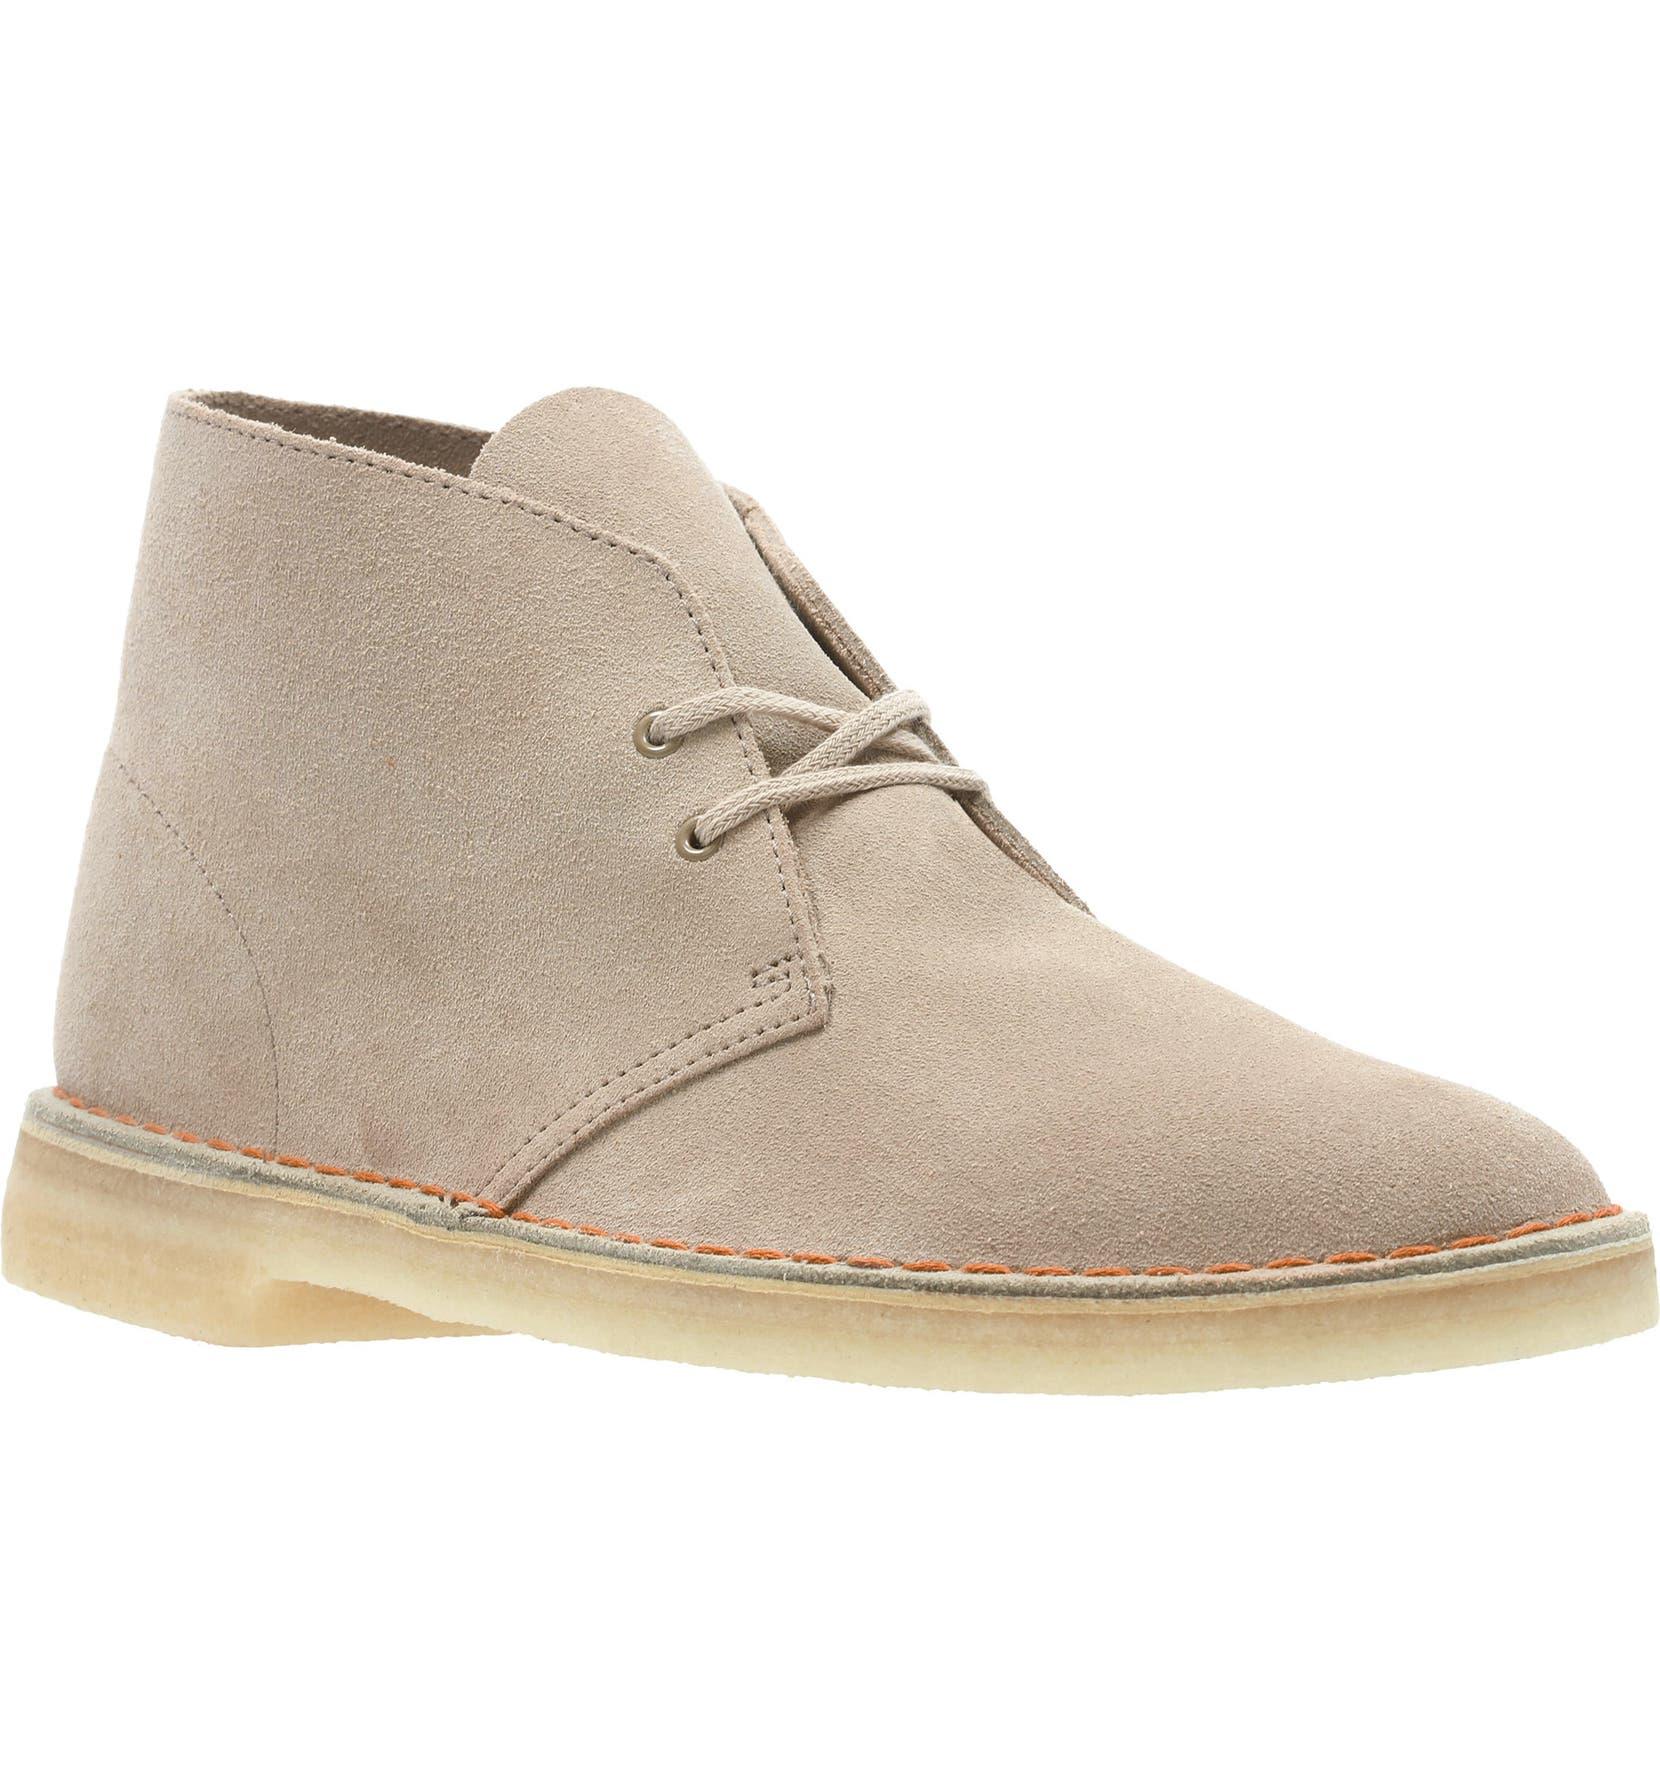 new products 100% quality great deals Originals 'Desert' Boot